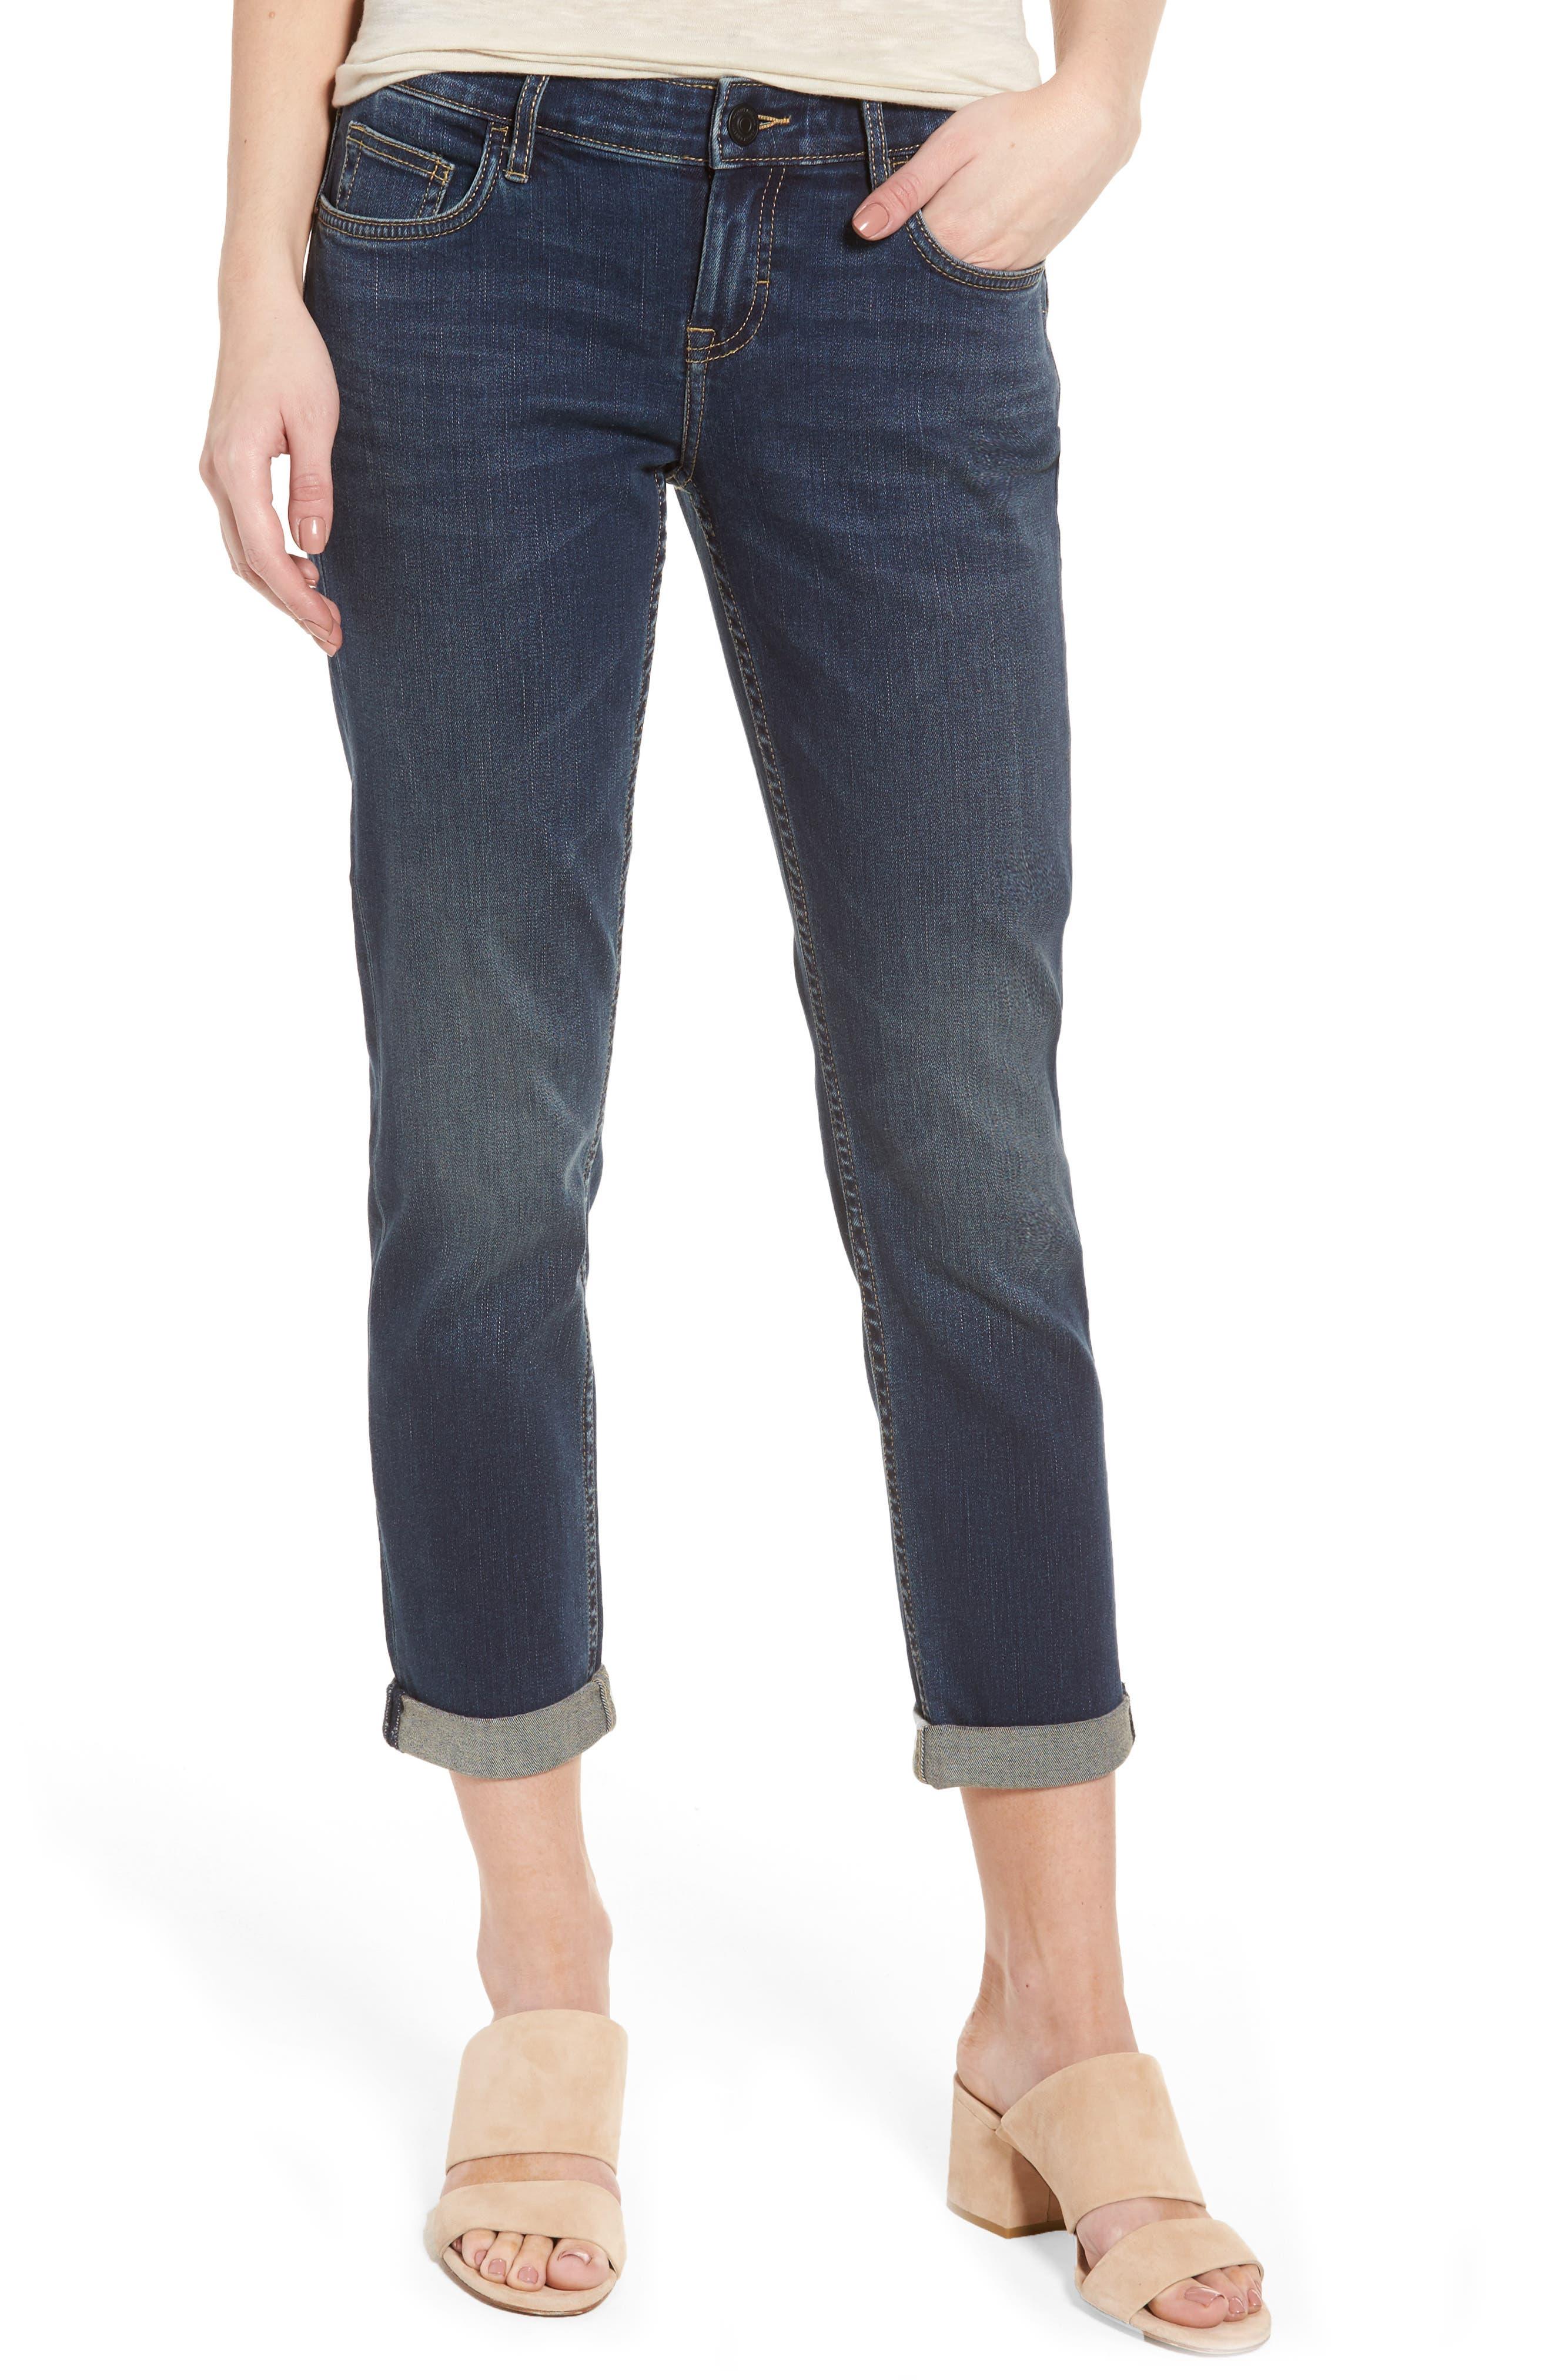 Tema Slim Boyfriend Jeans,                         Main,                         color, Dark Beach Wash